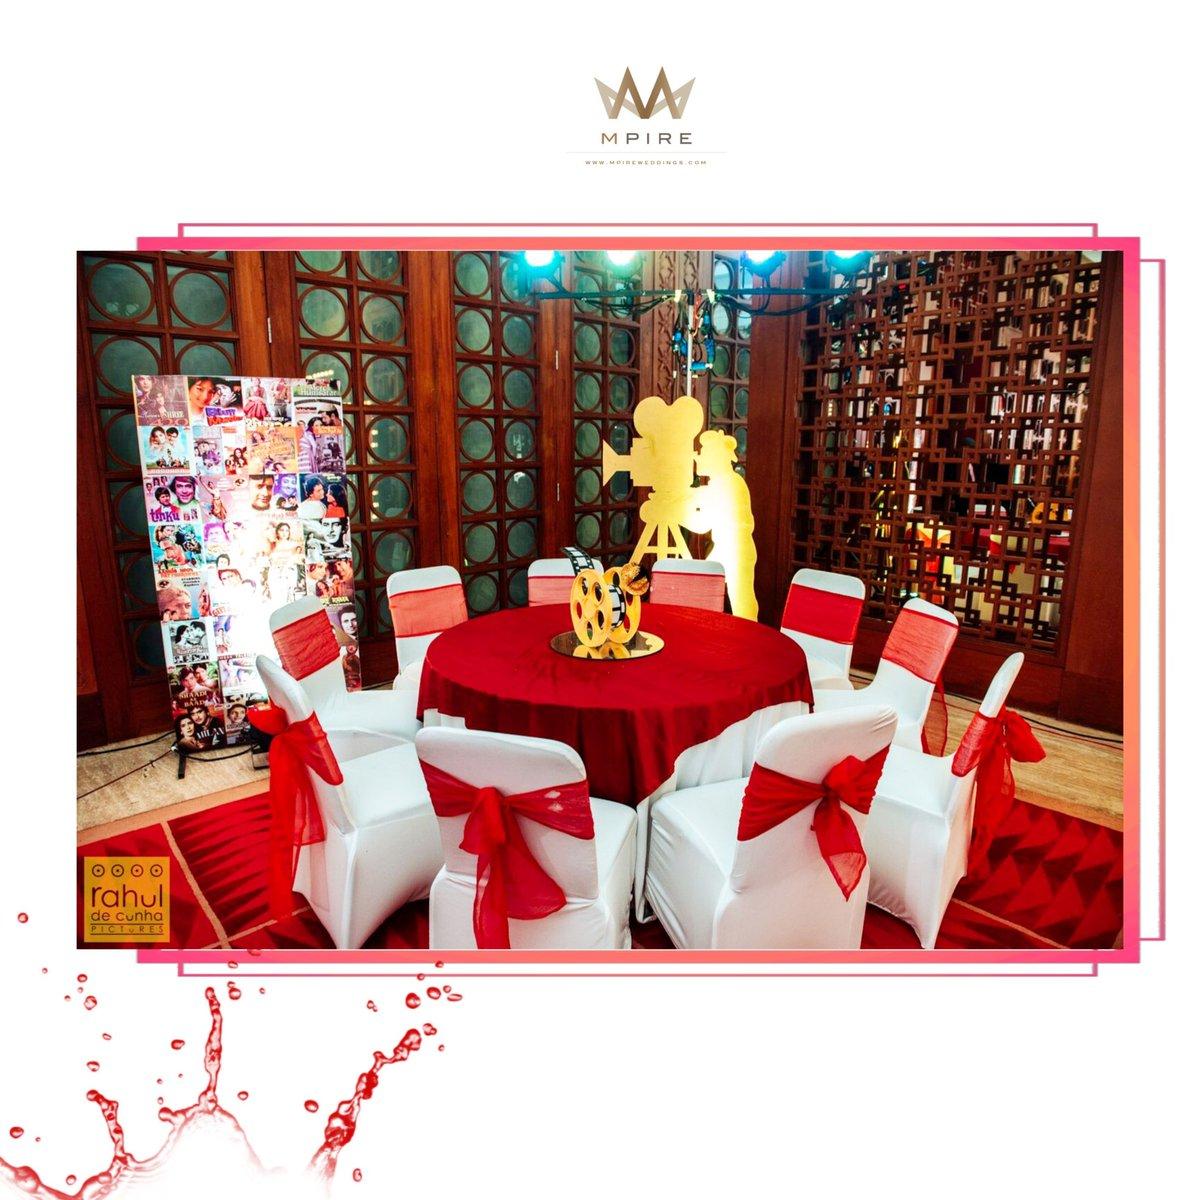 The perfect decor for such a filmy couple #SangeetGoals! #WeddingSaga   #Mpire #MpireWeddings #WeddingPlanners #Sangeet #Bollywood #Theme #SangeetNight #Decor #Bride #Groom #Drama #IndianWedding #DestinationWedding #AlilaDiwa #Goapic.twitter.com/m1Nb19KCD2